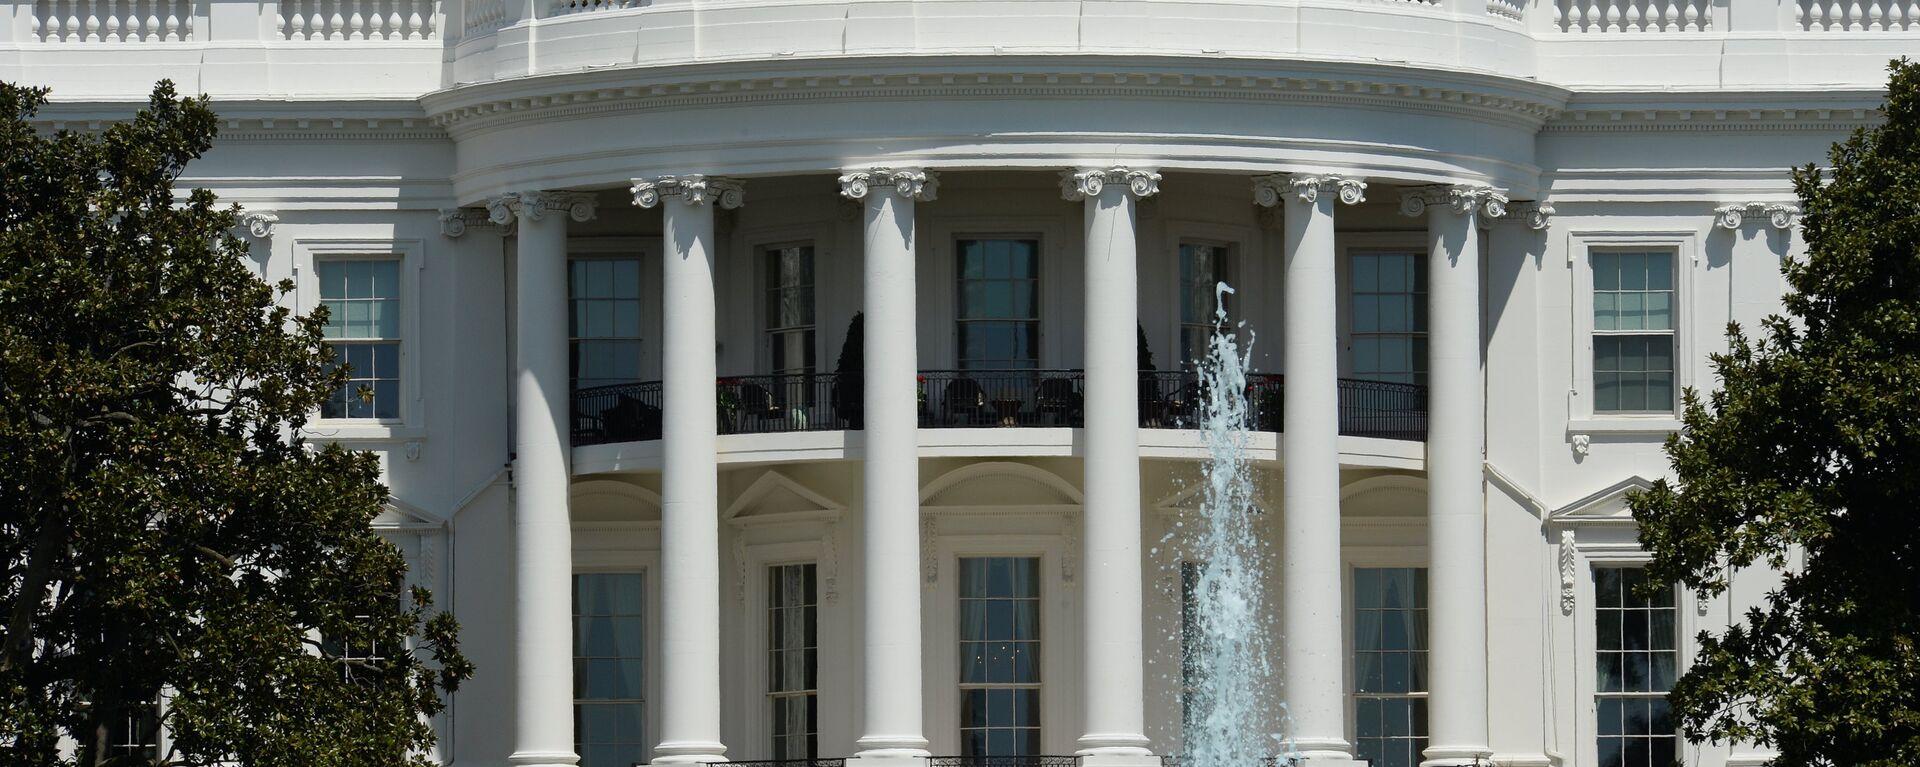 Белый дом в Вашингтоне - Sputnik Узбекистан, 1920, 03.06.2020